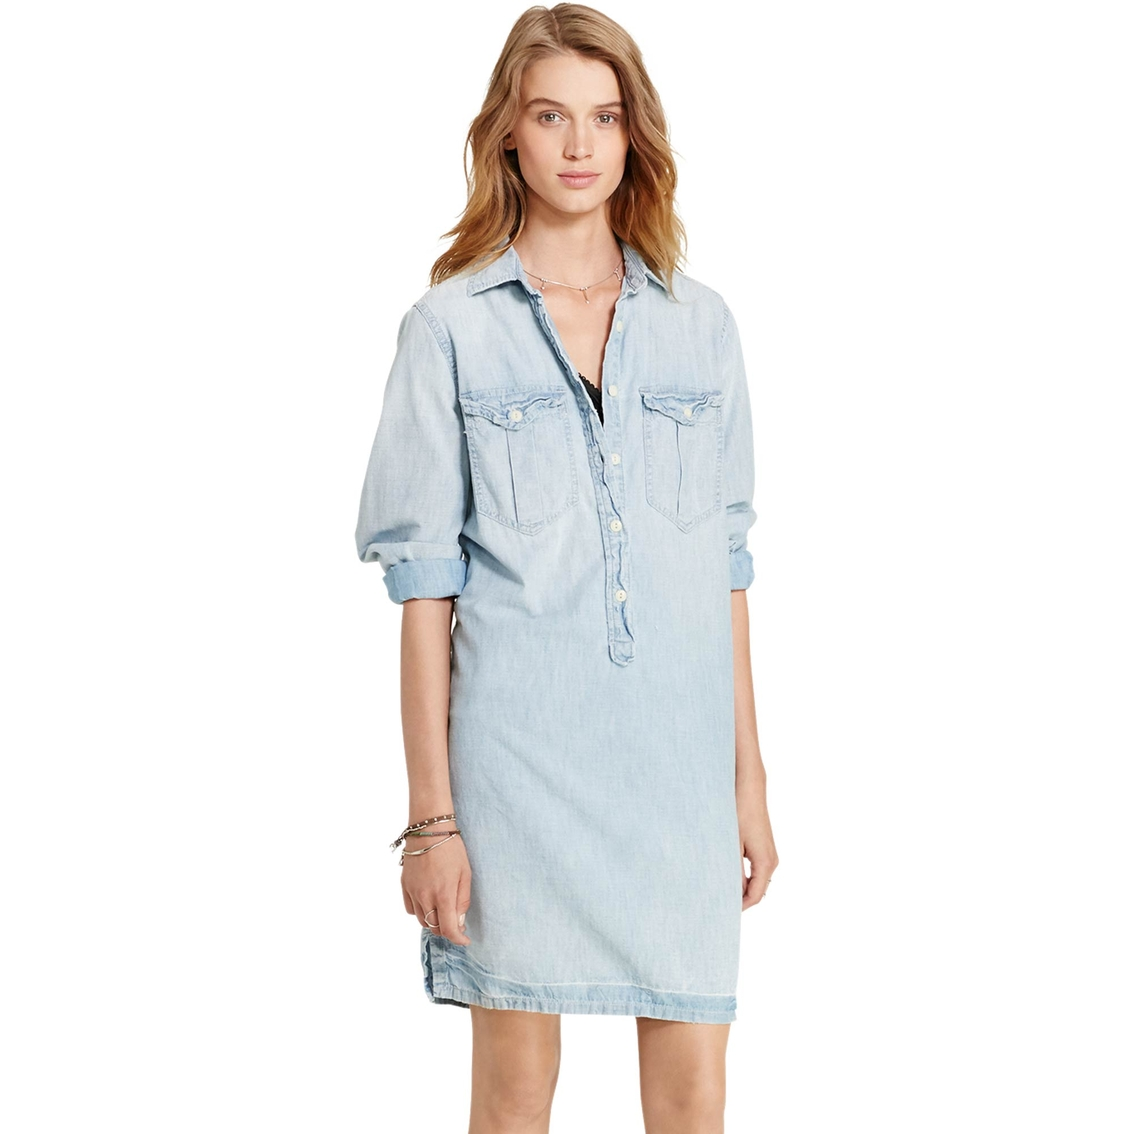 amp; Antique Supply Ralph Shirtdress Surplus Lauren Chambray Denim FCwqUx6dF